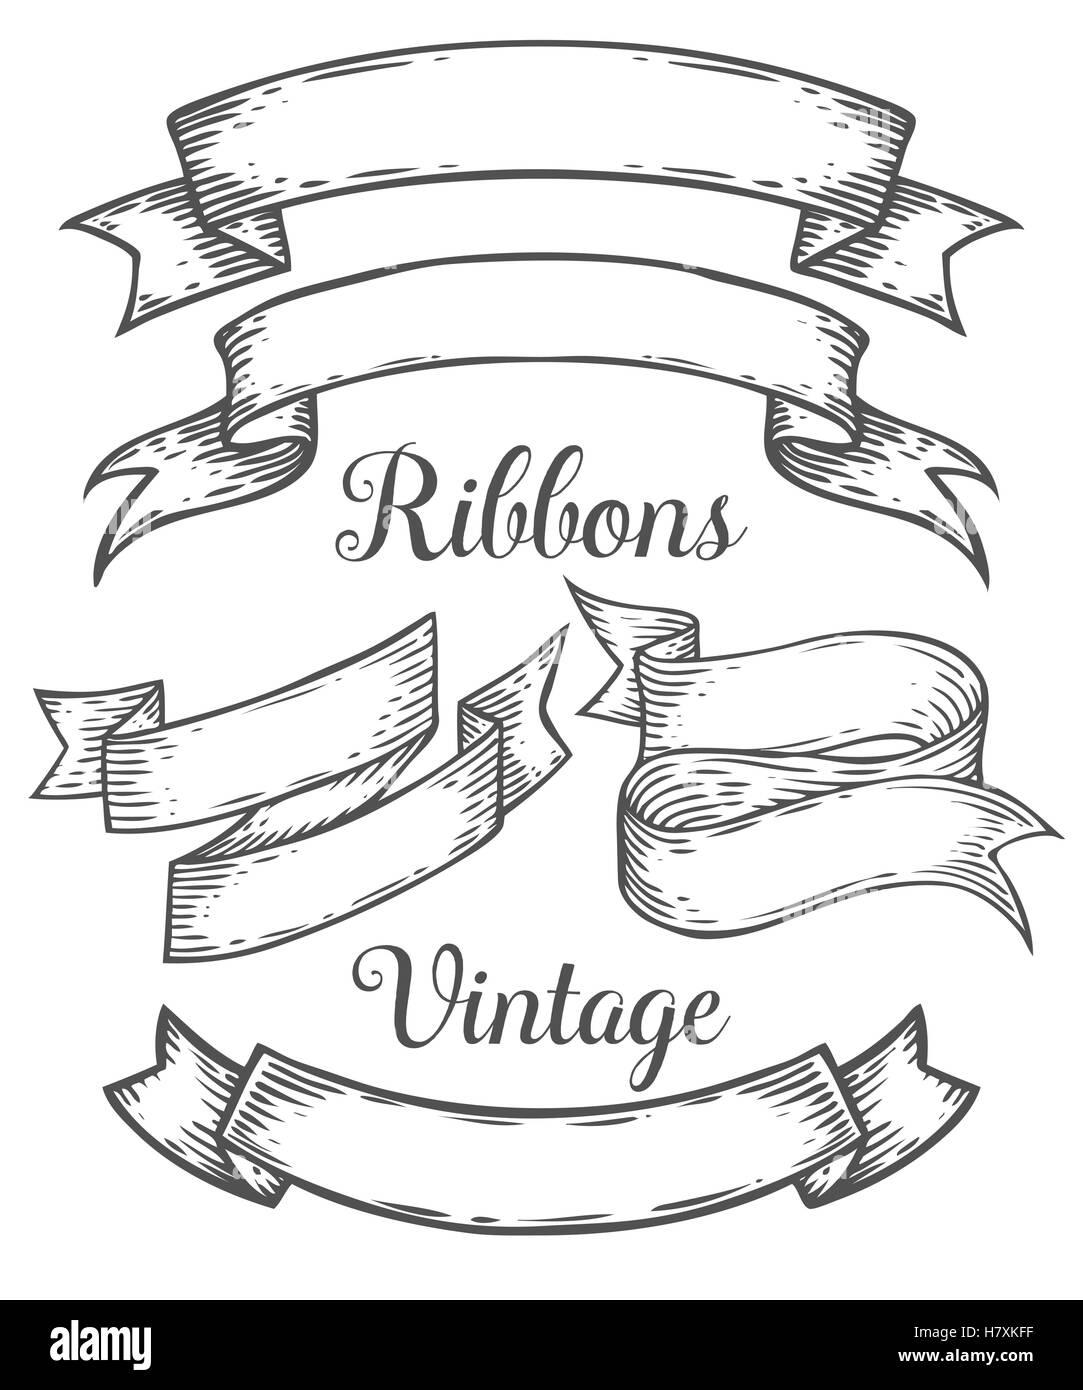 ribbon retro vintage hand drawn illustration vector set sketch